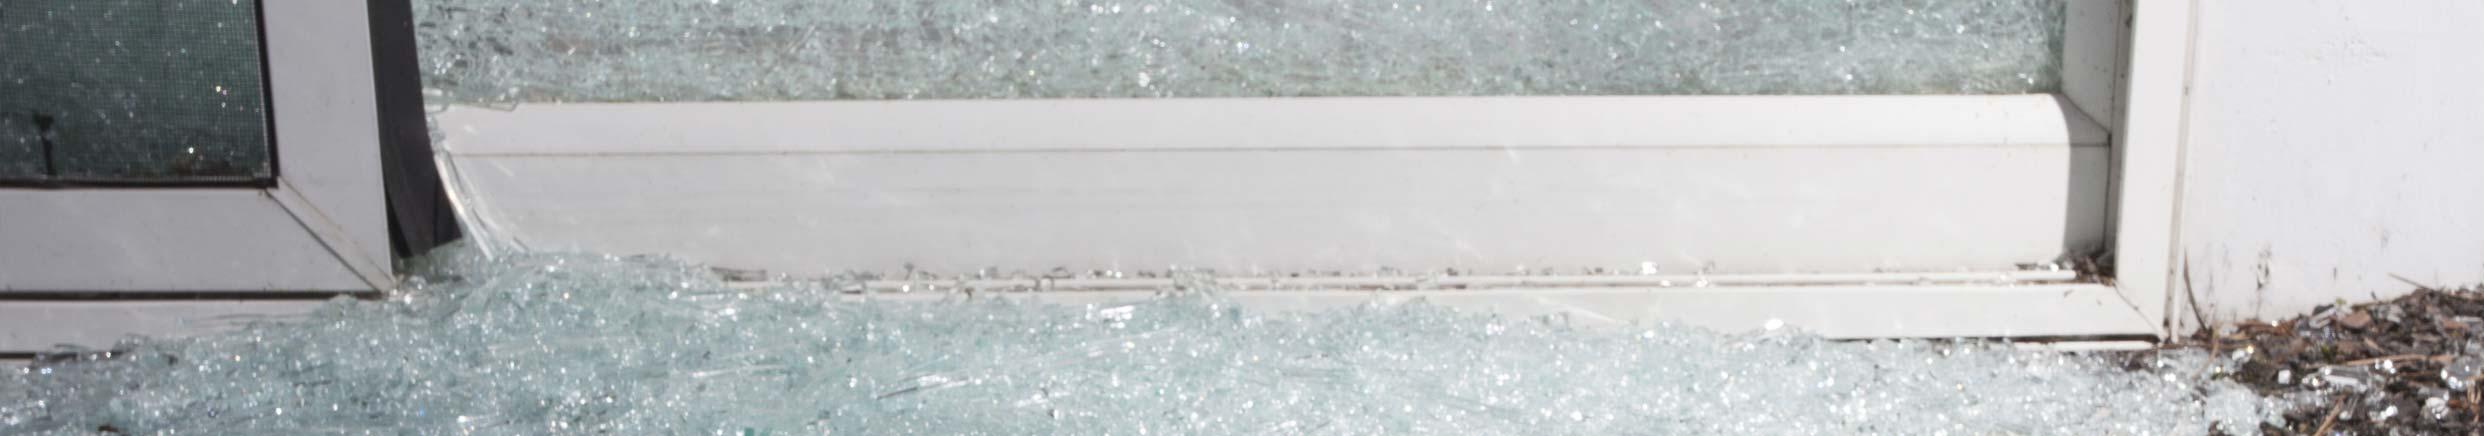 24 Hour Emergency Glaziers / Glass Repair Surrey, Hampshire & Berkshire